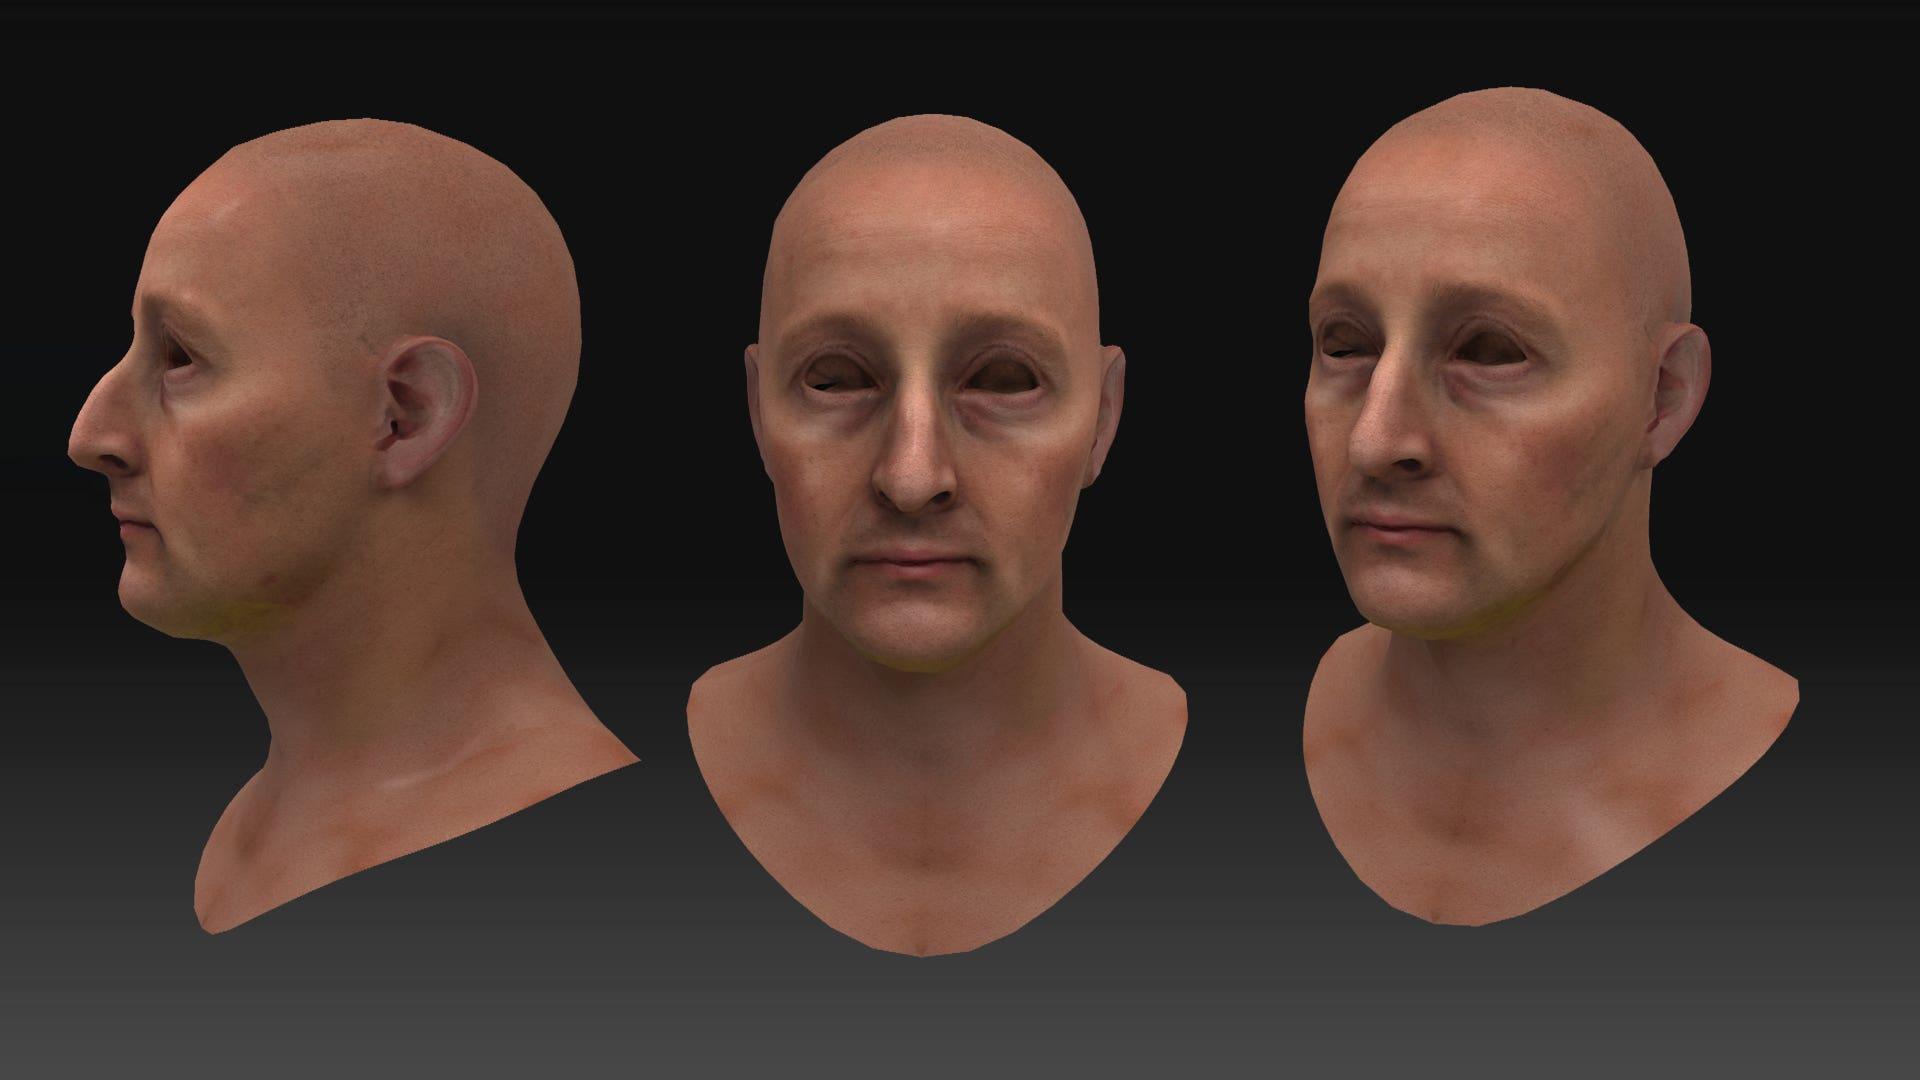 Realistic head modelling